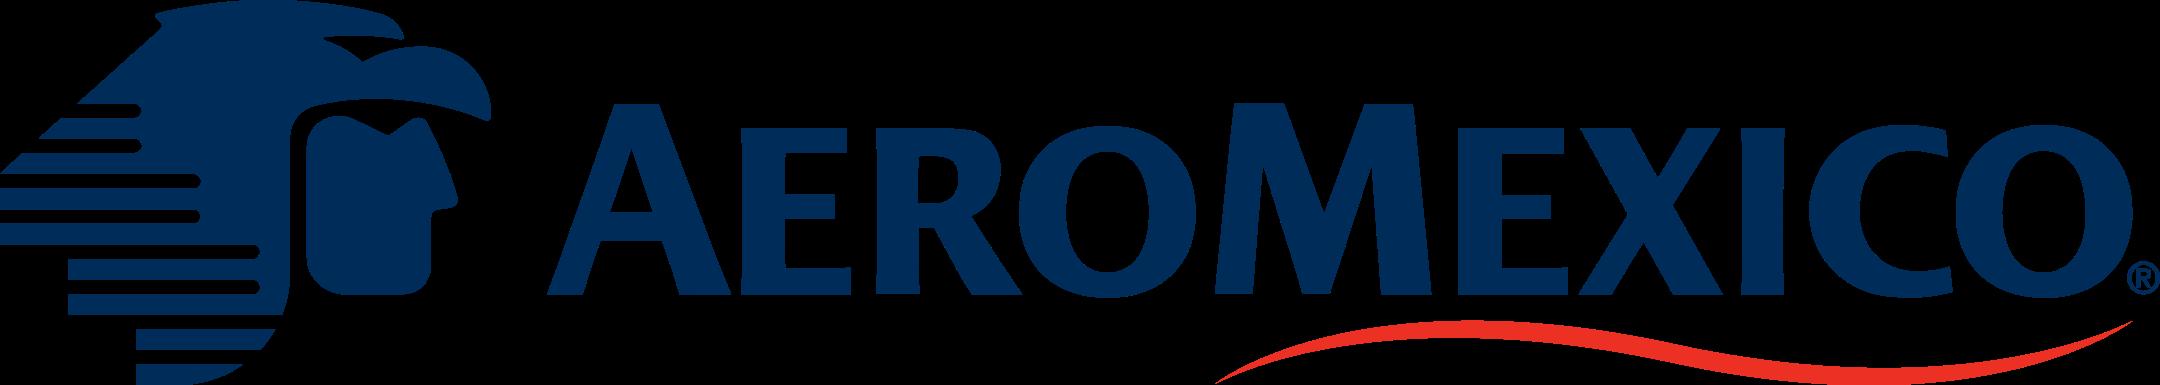 aeromexico-logo-1